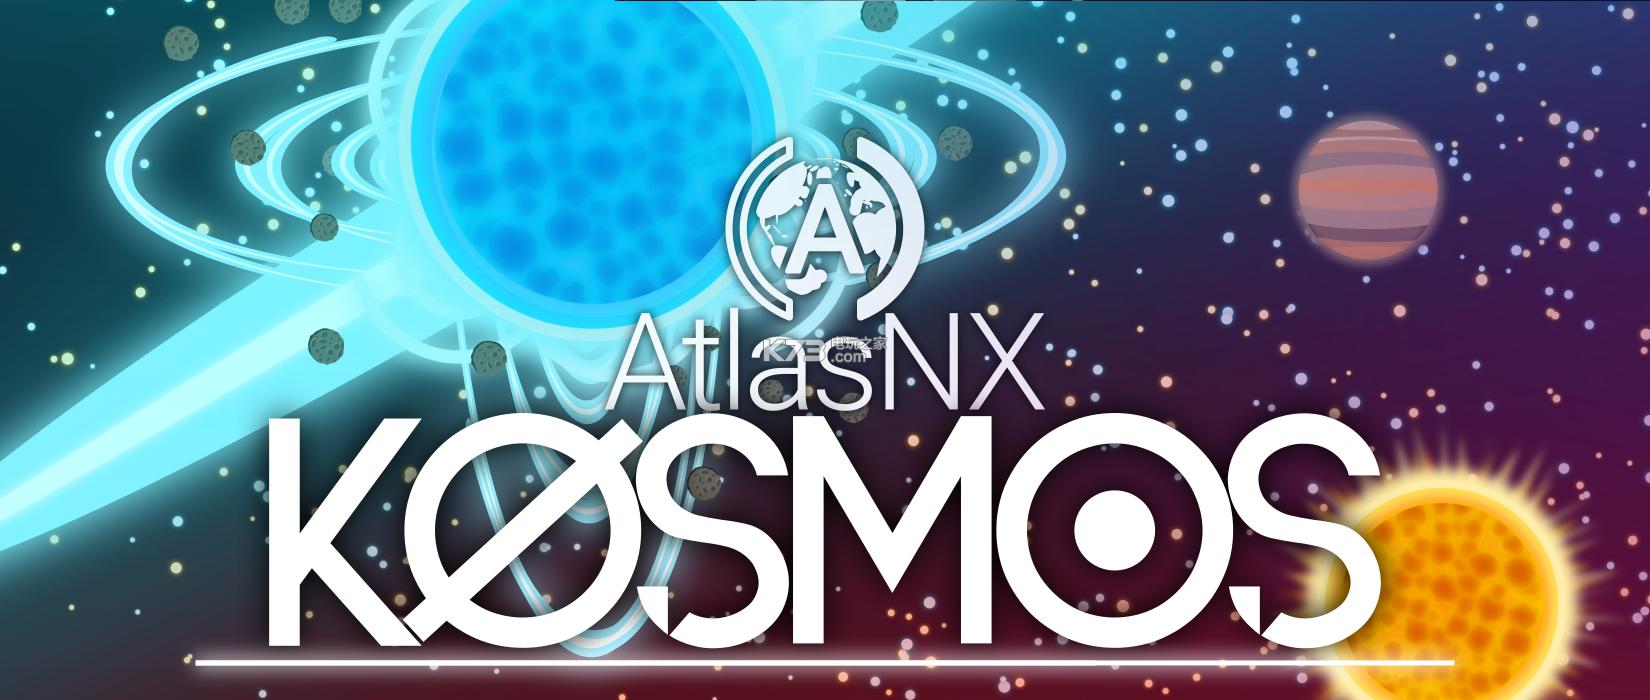 Kosmos 13.0.2 最新版下载[破解合集包] 截图